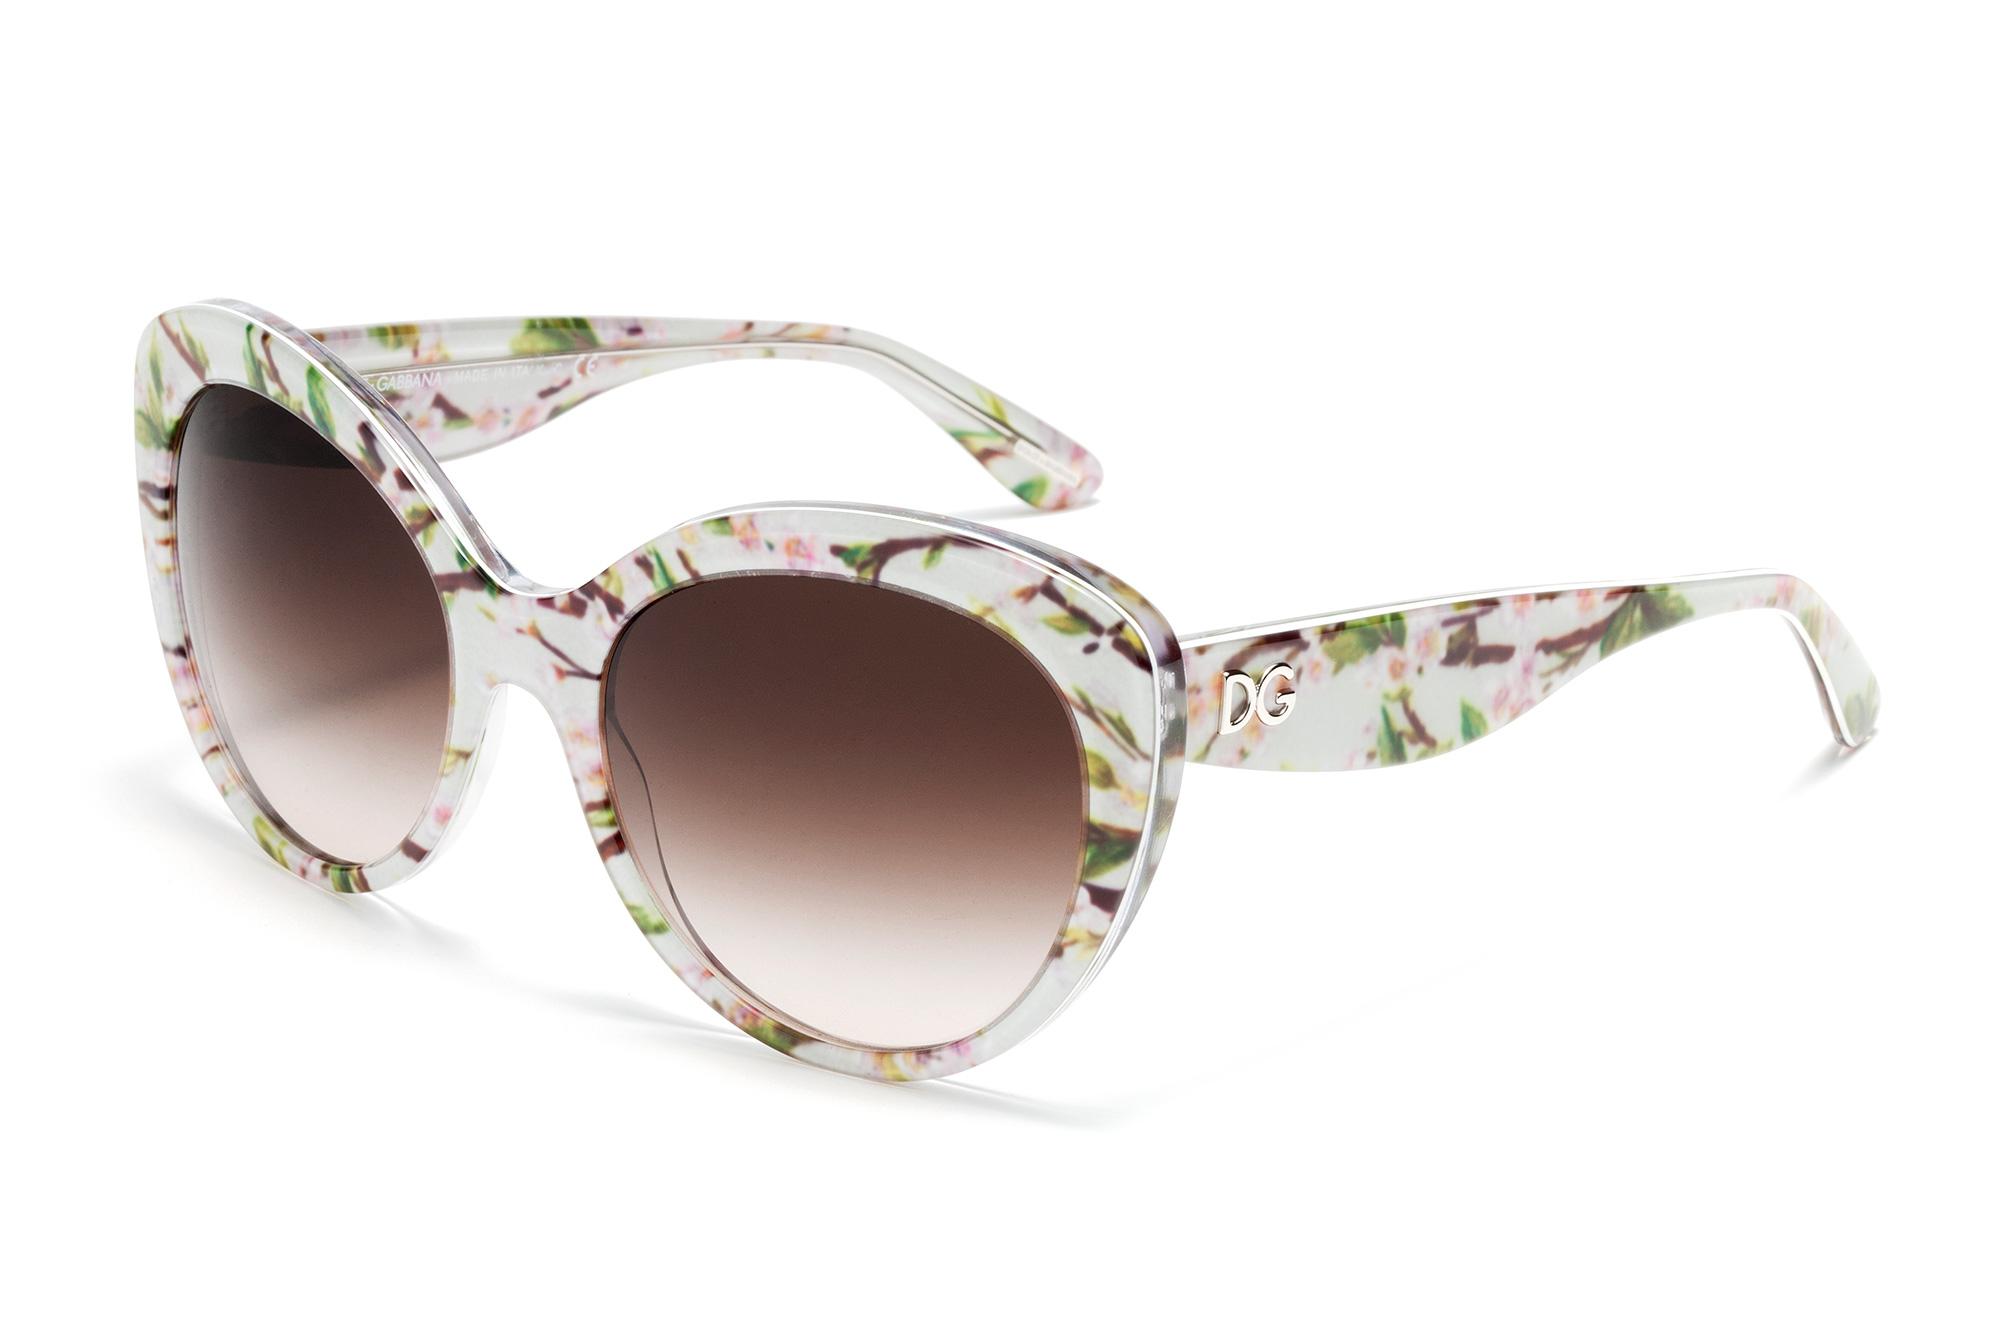 dolce-and-gabbana-eyewear-sunglasses-woman-almond-flowers-DG4236_2843_13-zoom1.jpg